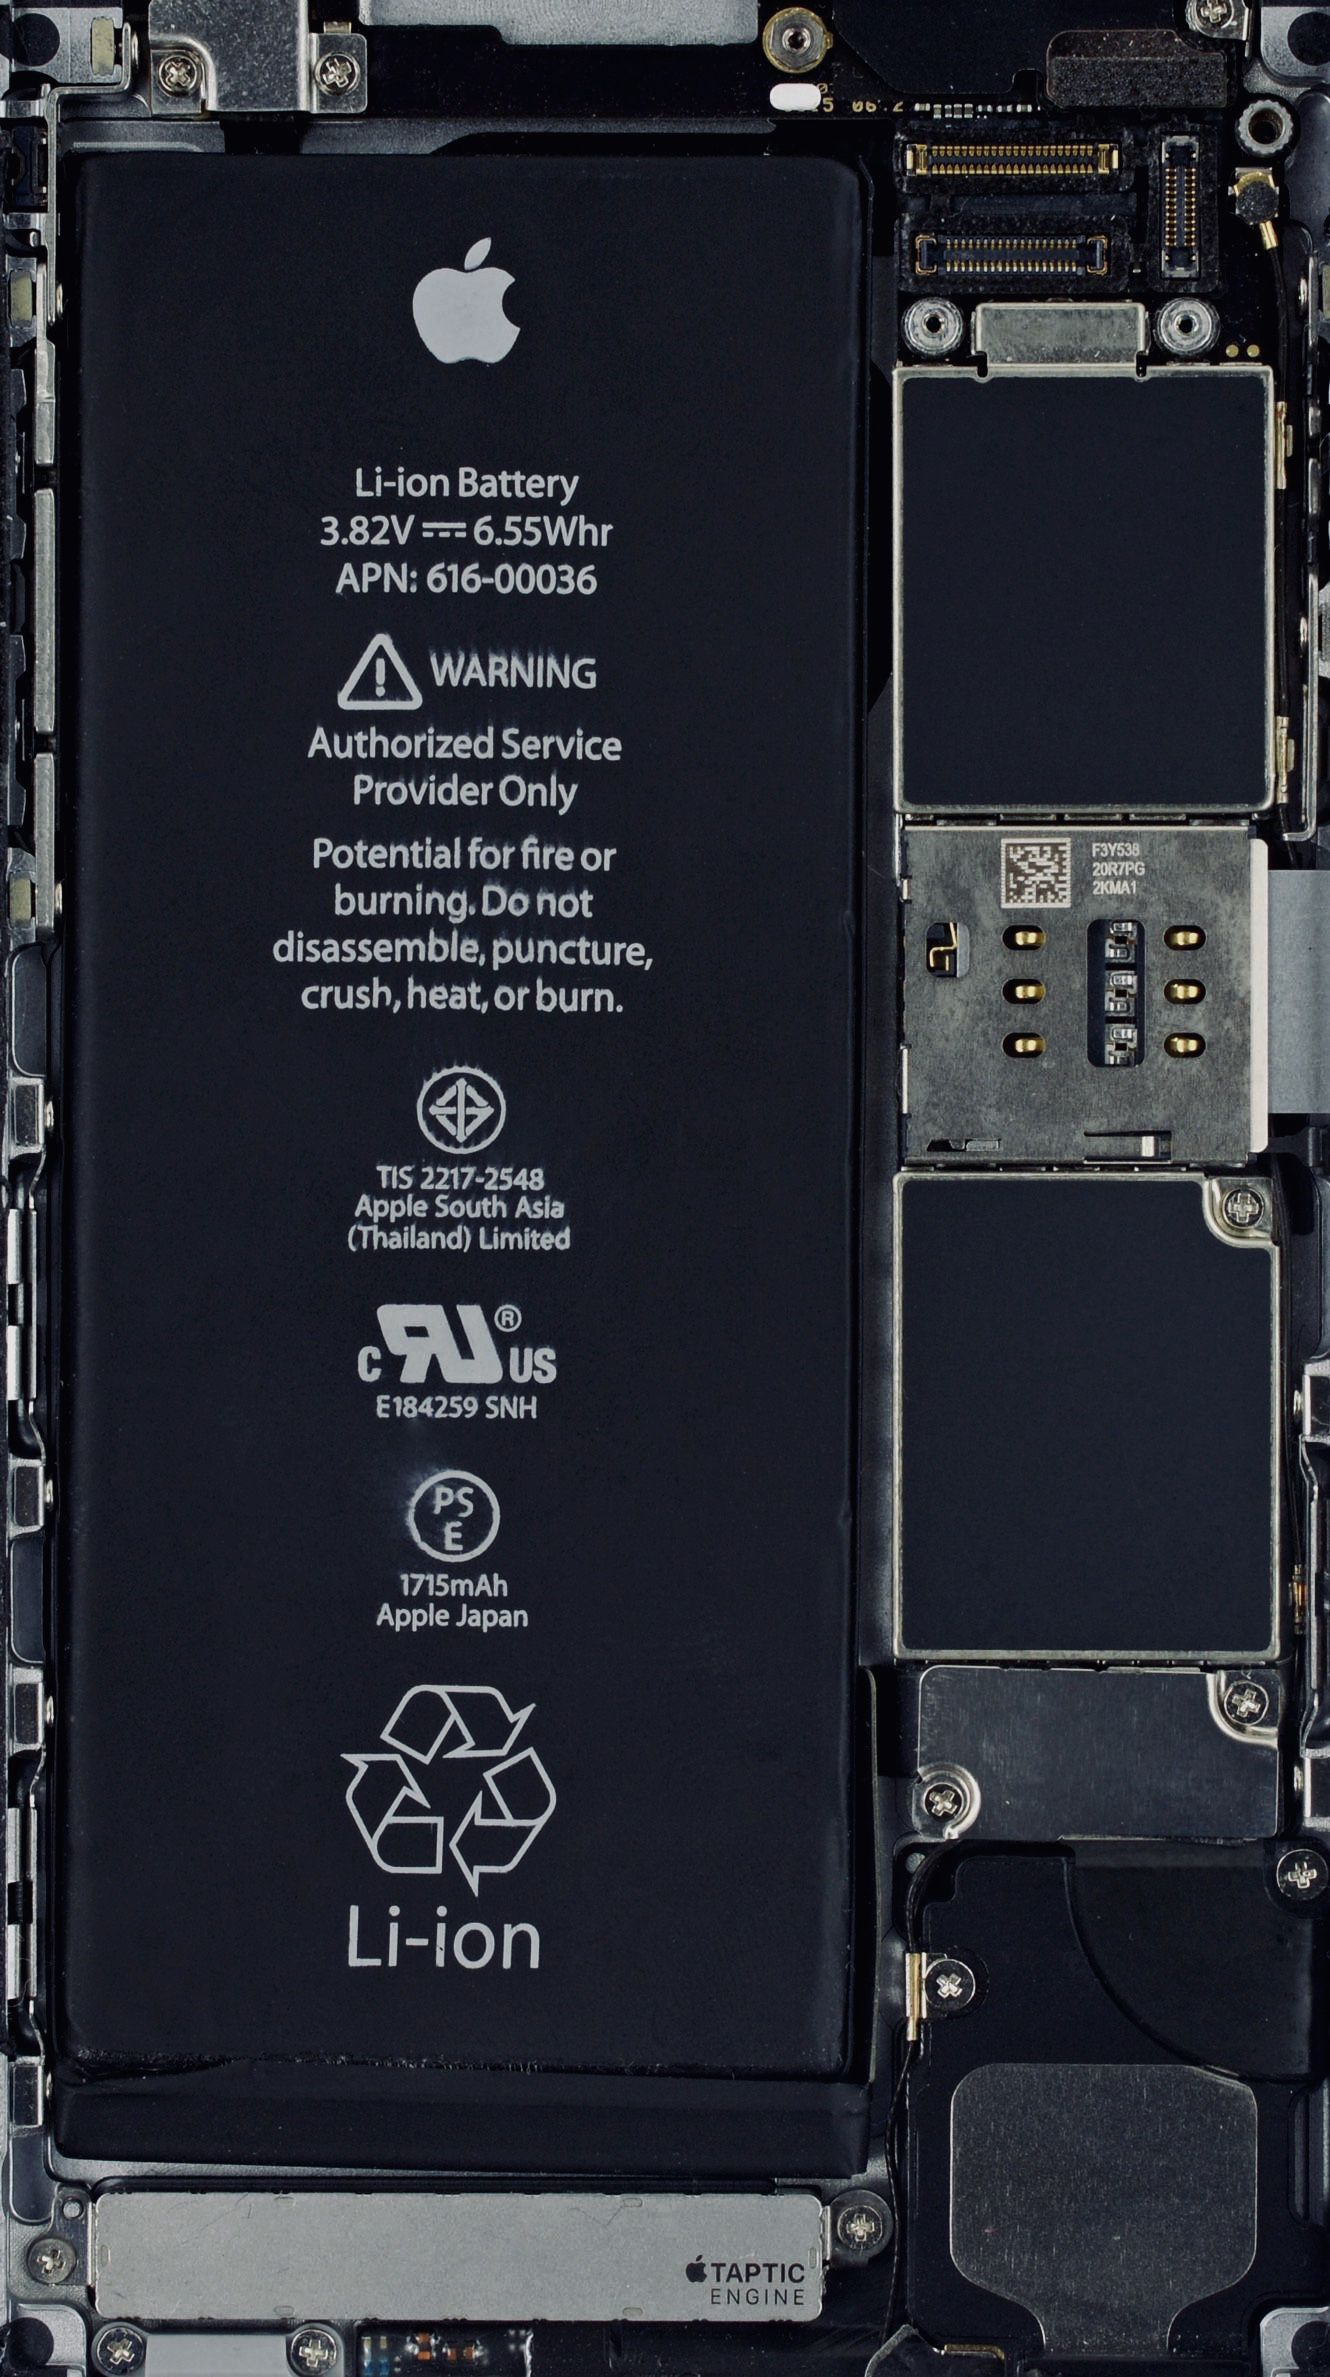 Iphone 6s Inside Wallpaper Iphone 6s Wallpaper Iphone Wallpaper Inside Iphone 7 Plus Wallpaper